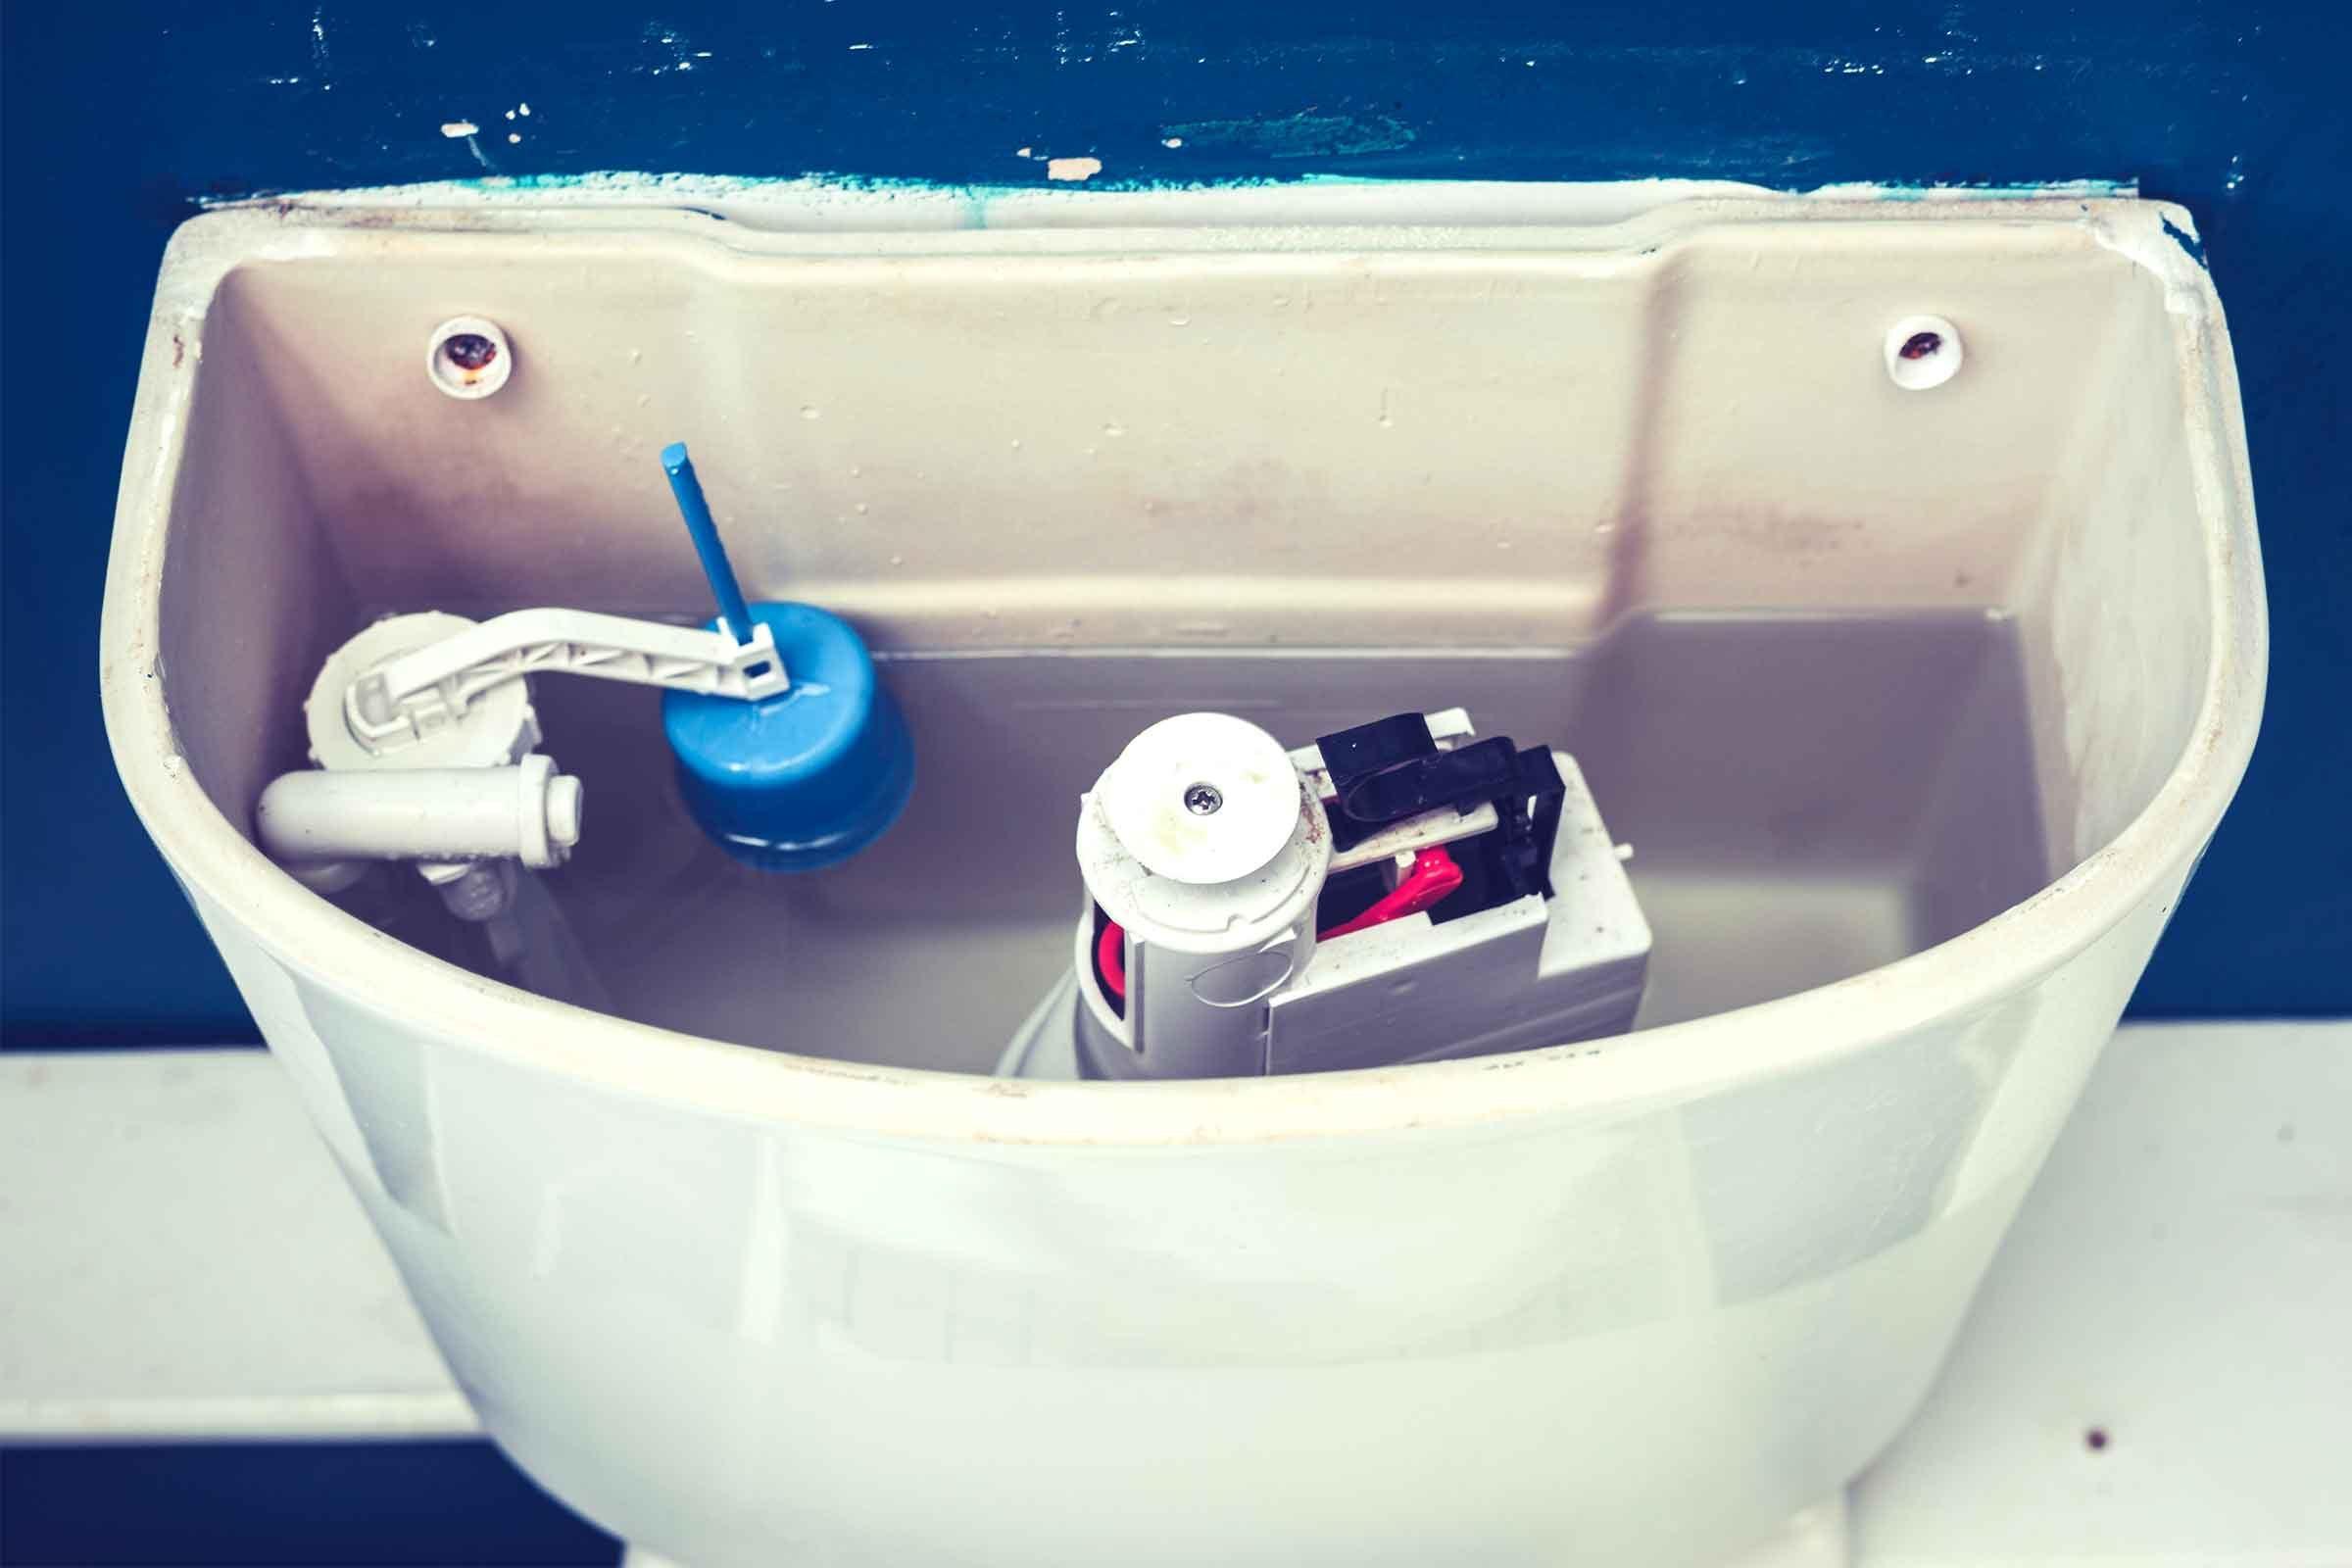 Plumber Tips: Plumbing Repair Secrets From Experts | Reader\u0027s Digest